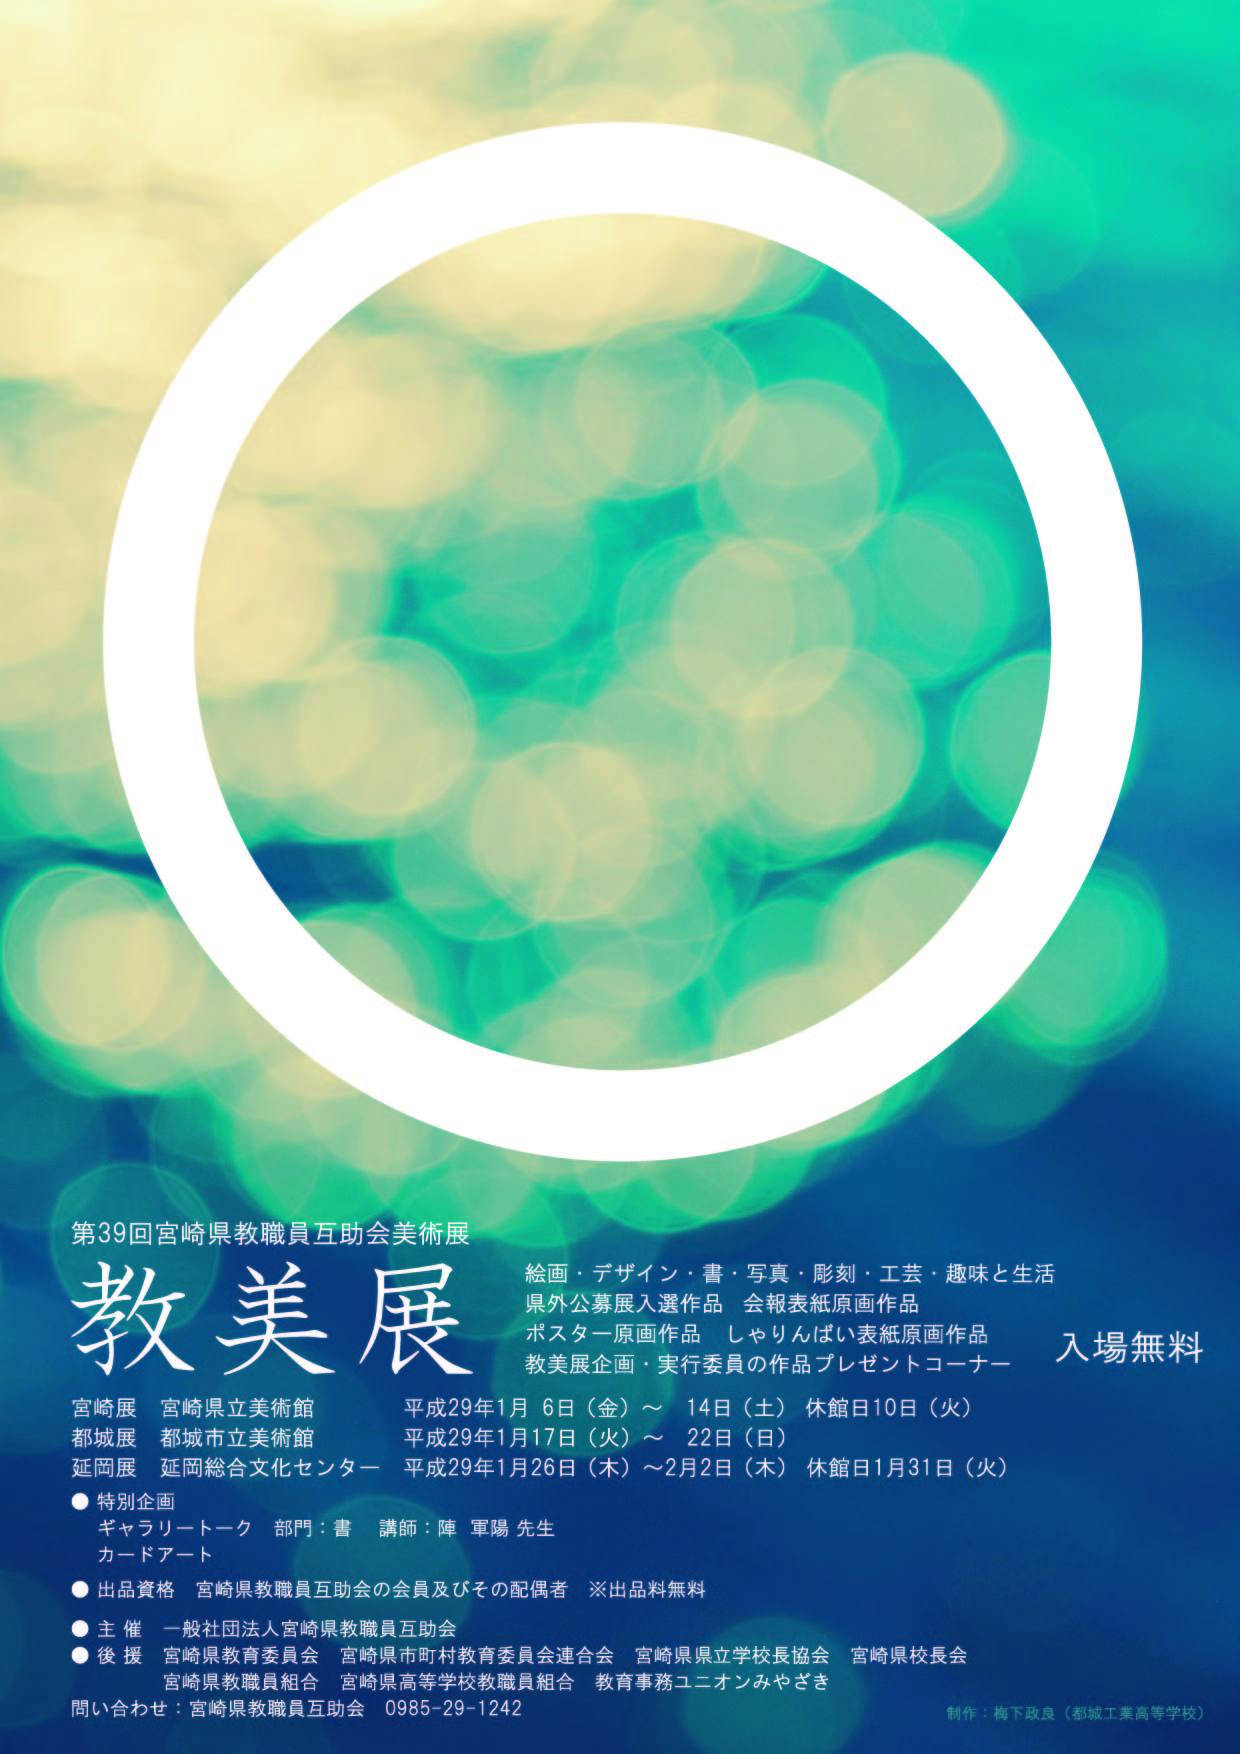 https://www.miyazaki-kyogo.or.jp/publiculture/exhibition/img/H28%E6%95%99%E7%BE%8E%E5%B1%95%E3%83%81%E3%83%A9%E3%82%B7.jpg